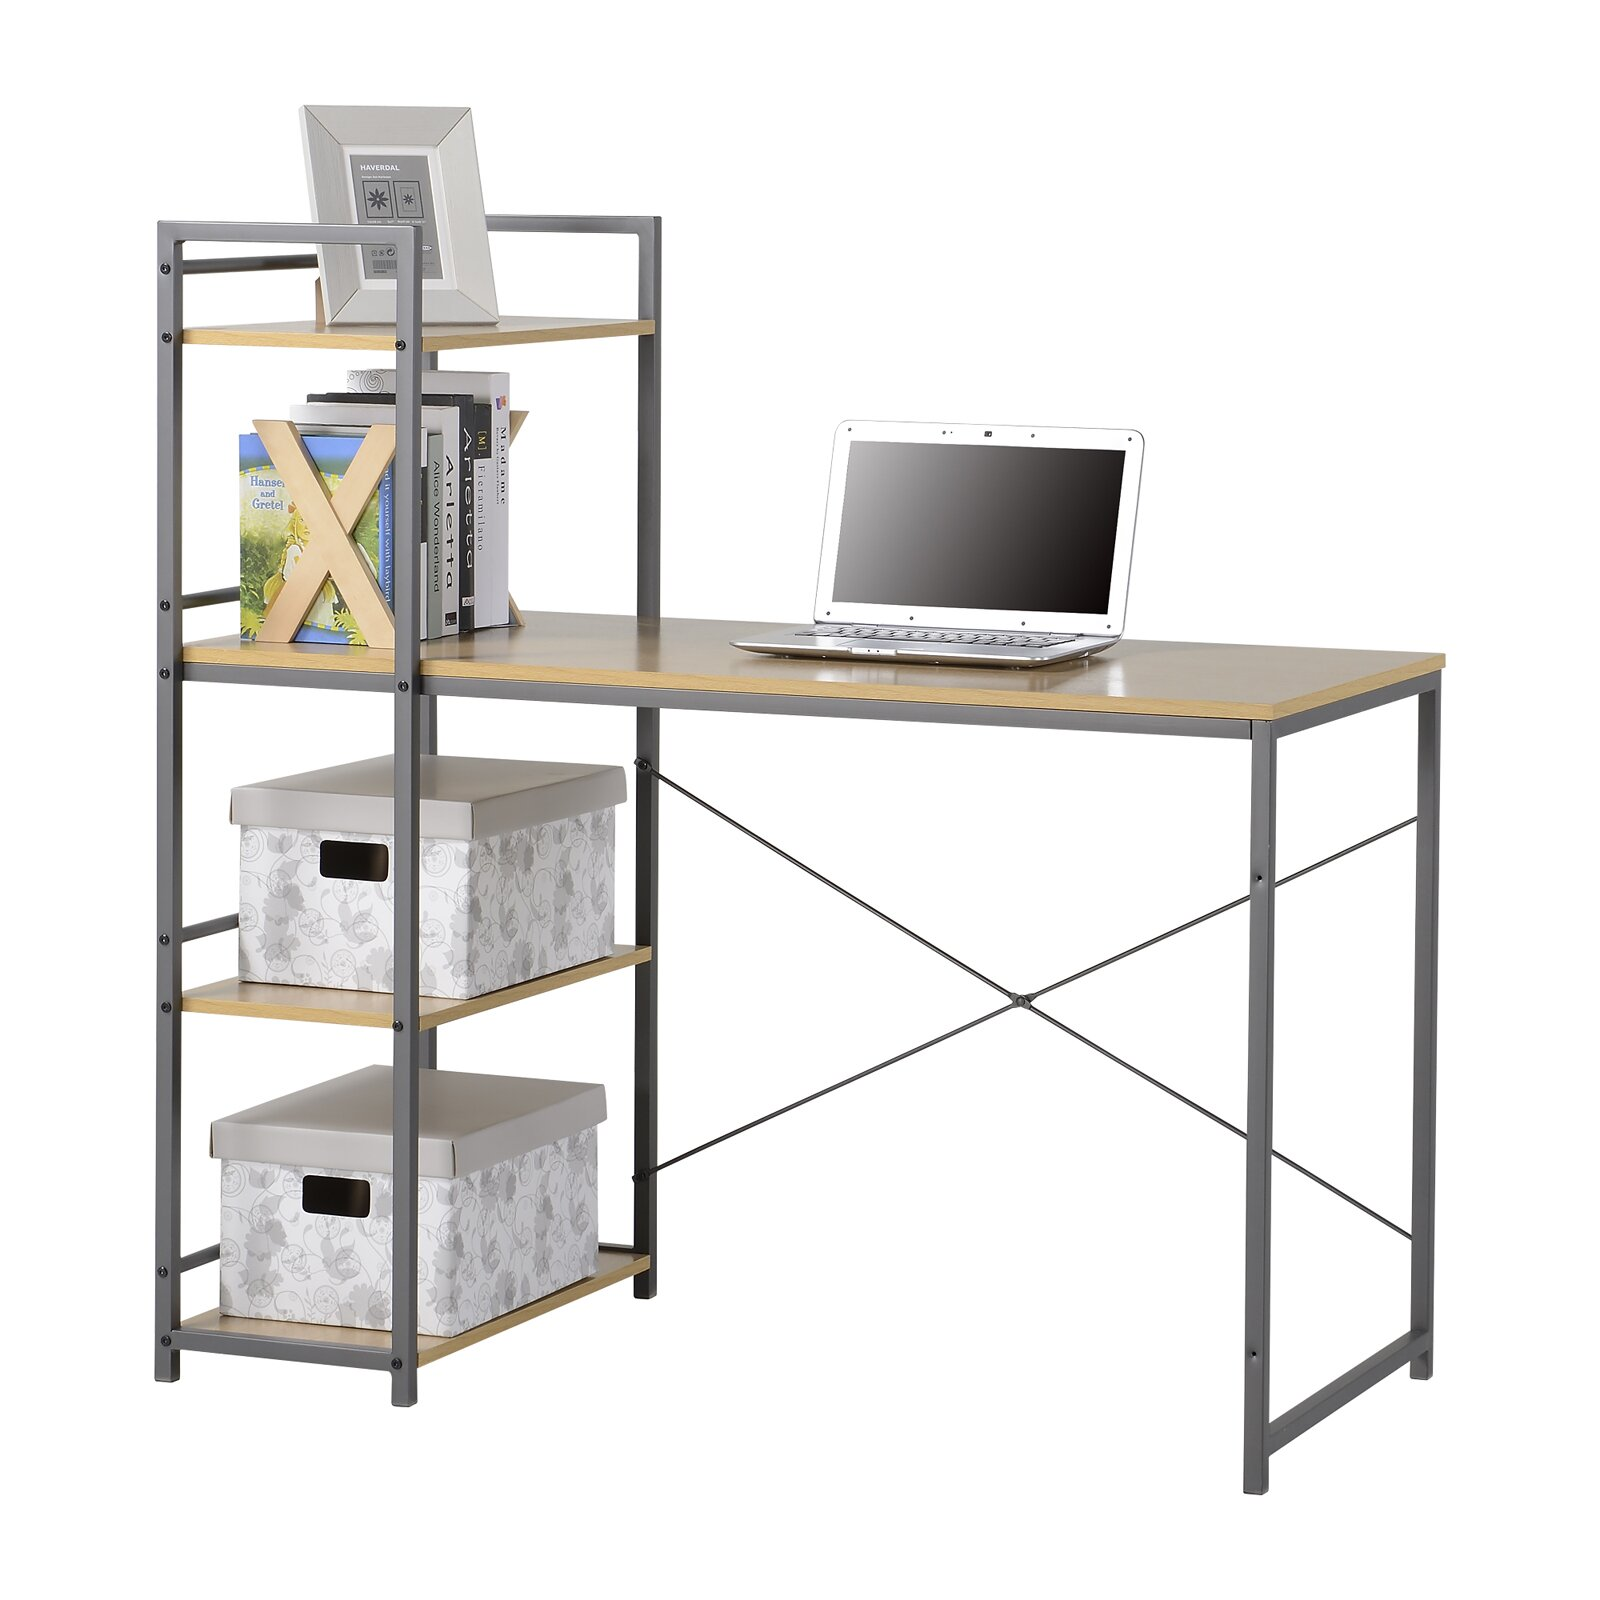 Bookcase Computer Desk: Homestar Computer Desk With Built-In 4 Shelf Bookcase